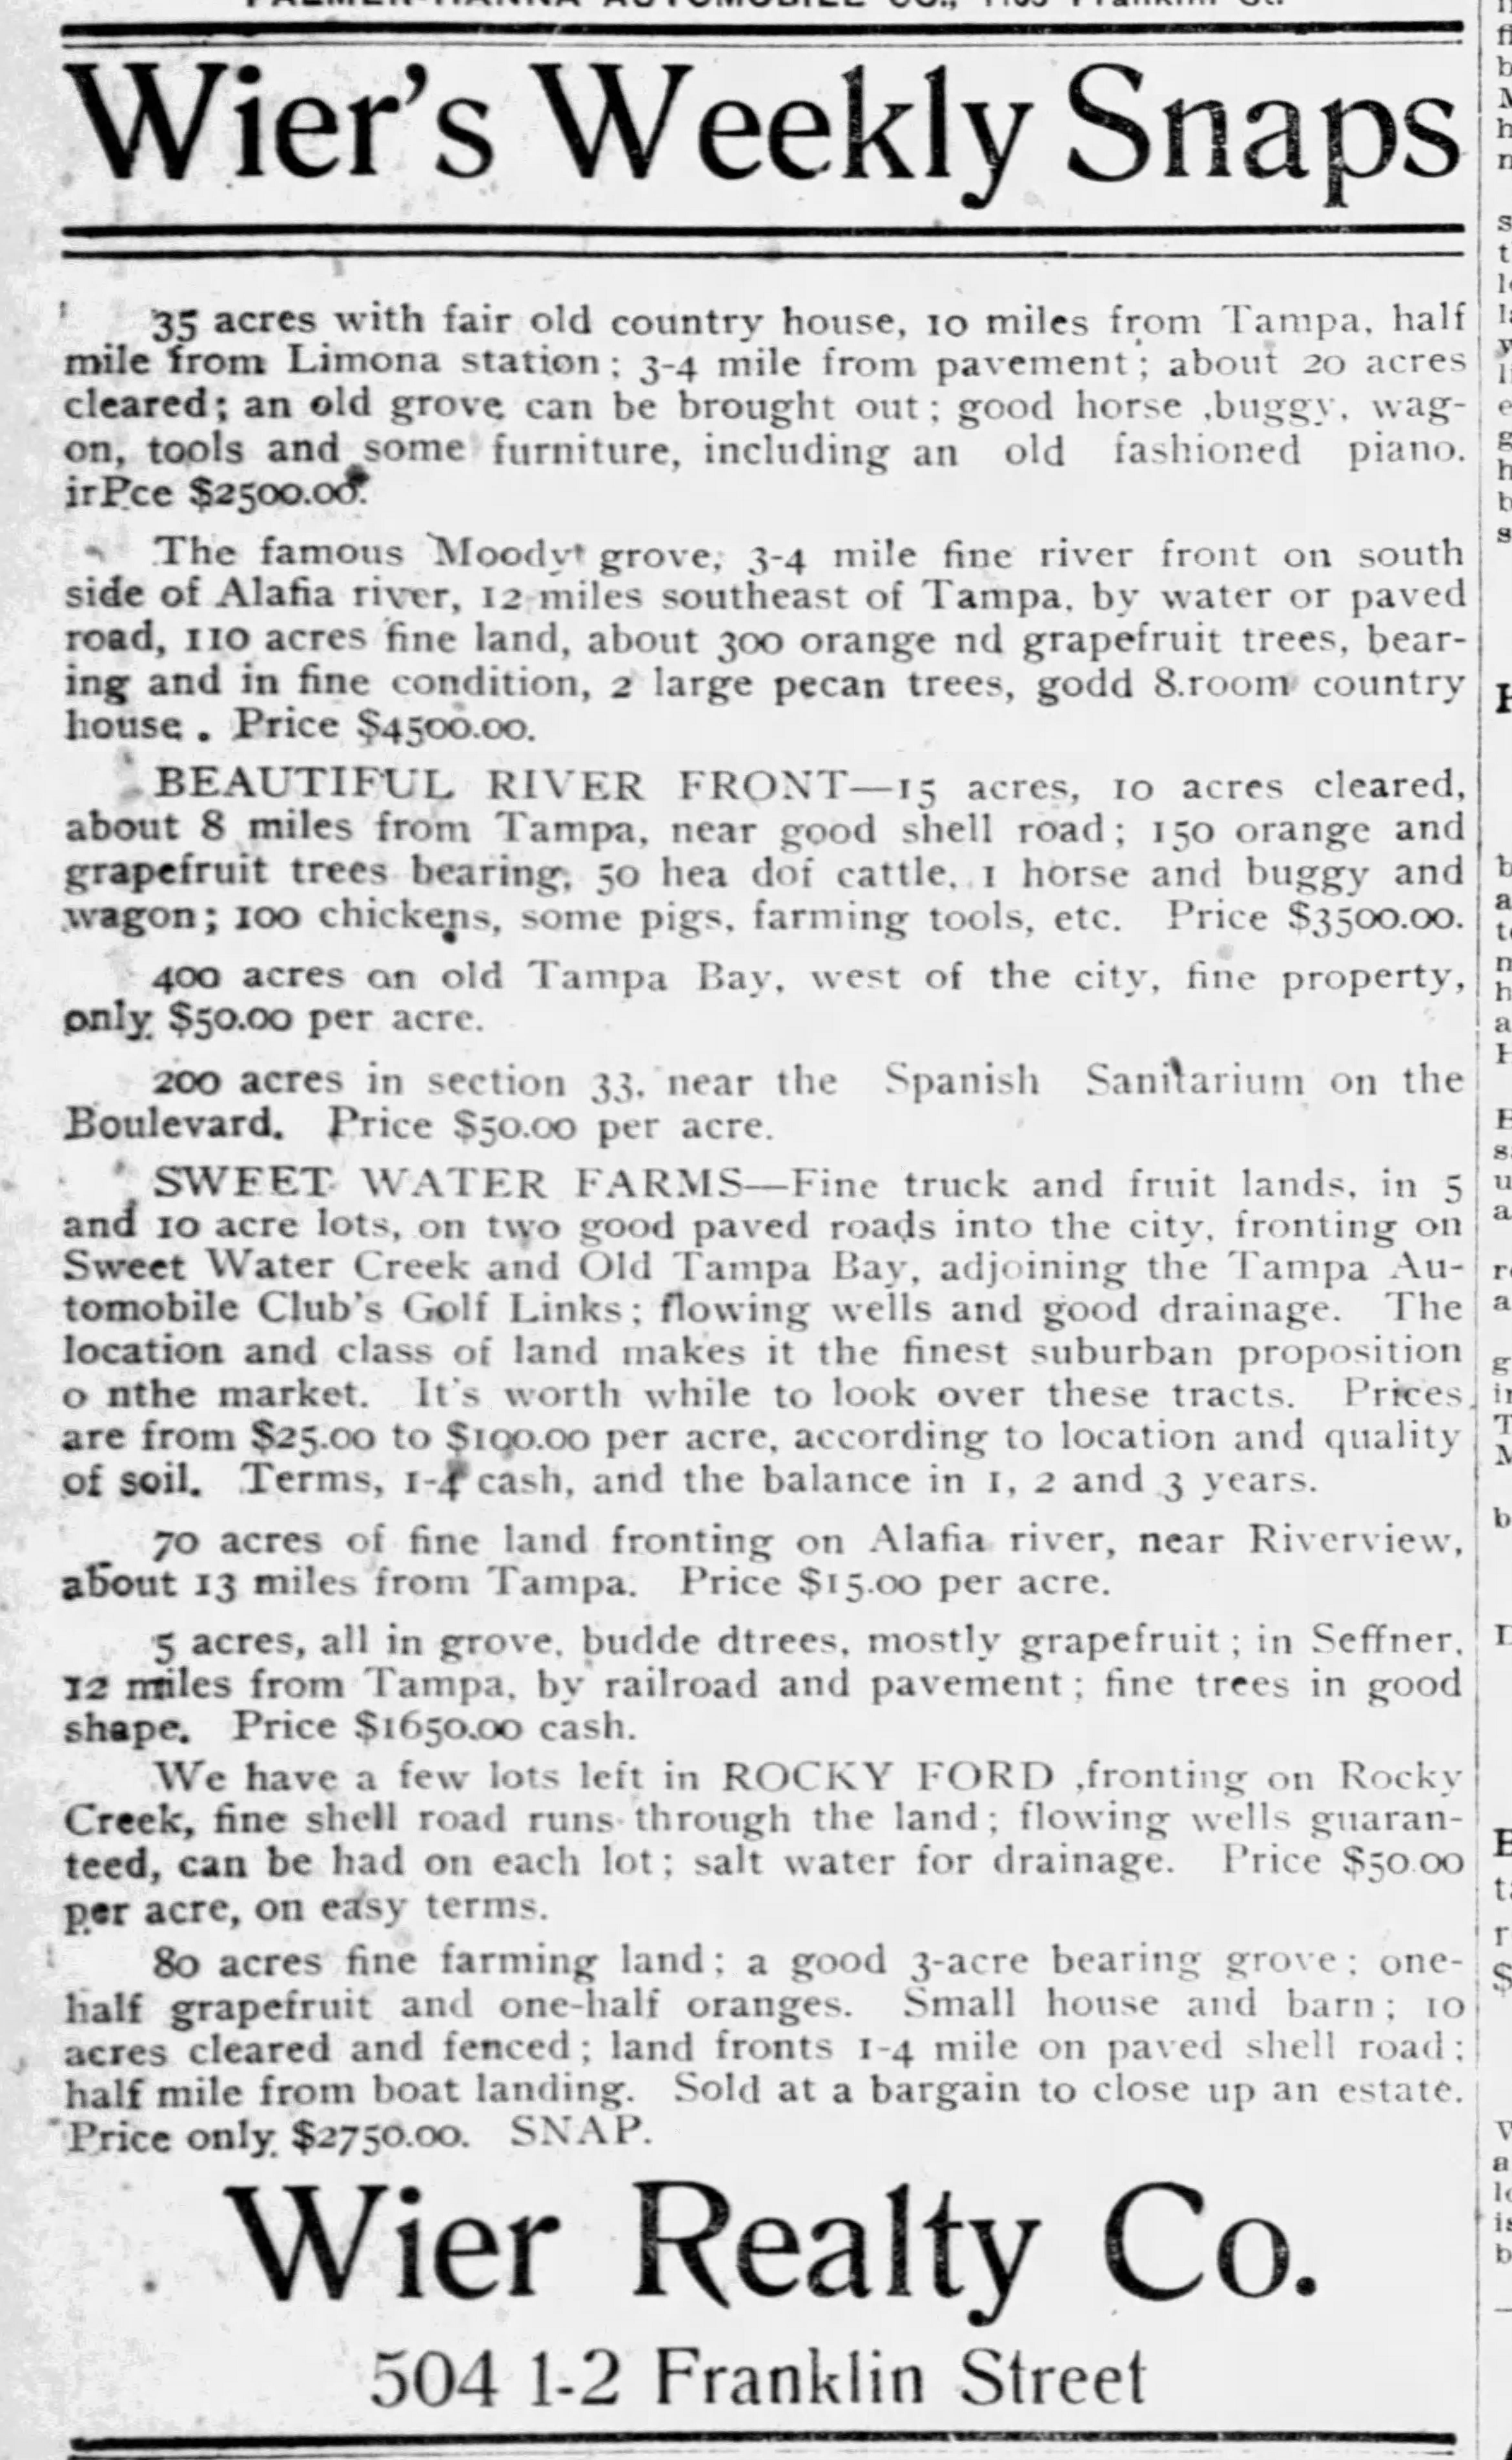 Sweet Water Farms Advertisement - Feb 19, 1911 Tampa Tribune